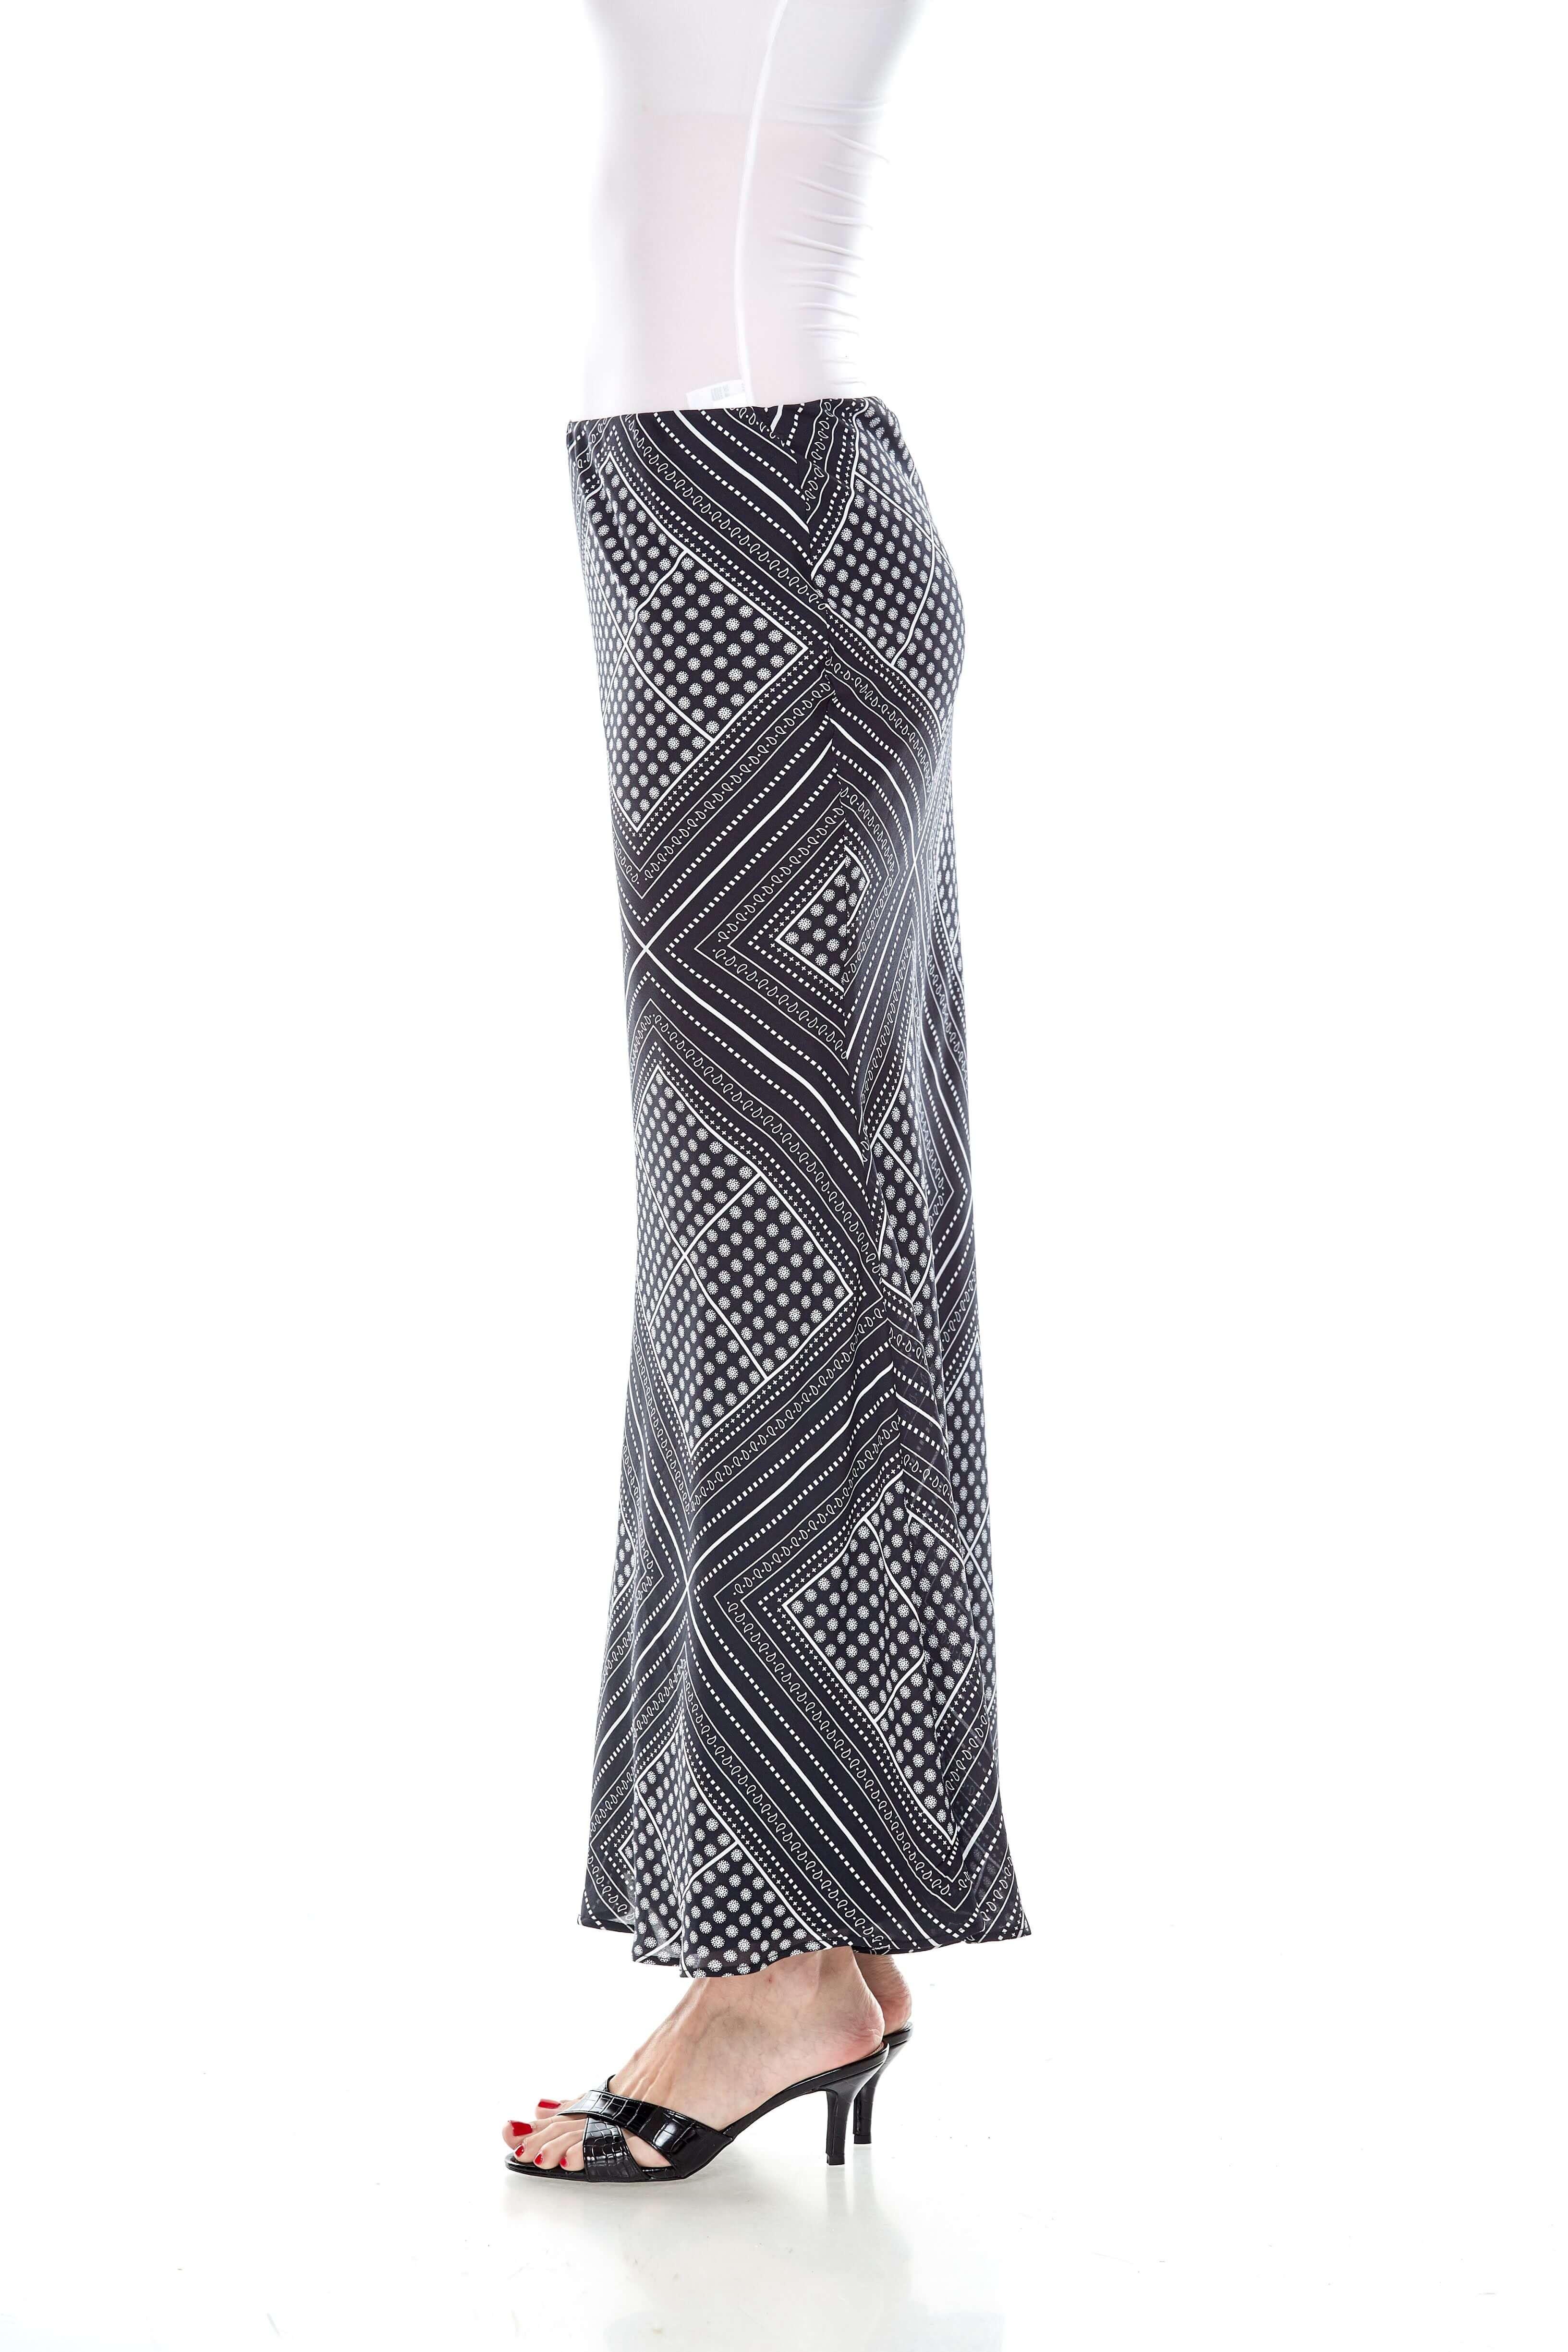 Black Handkerchief Print Mermaid Skirt (4)